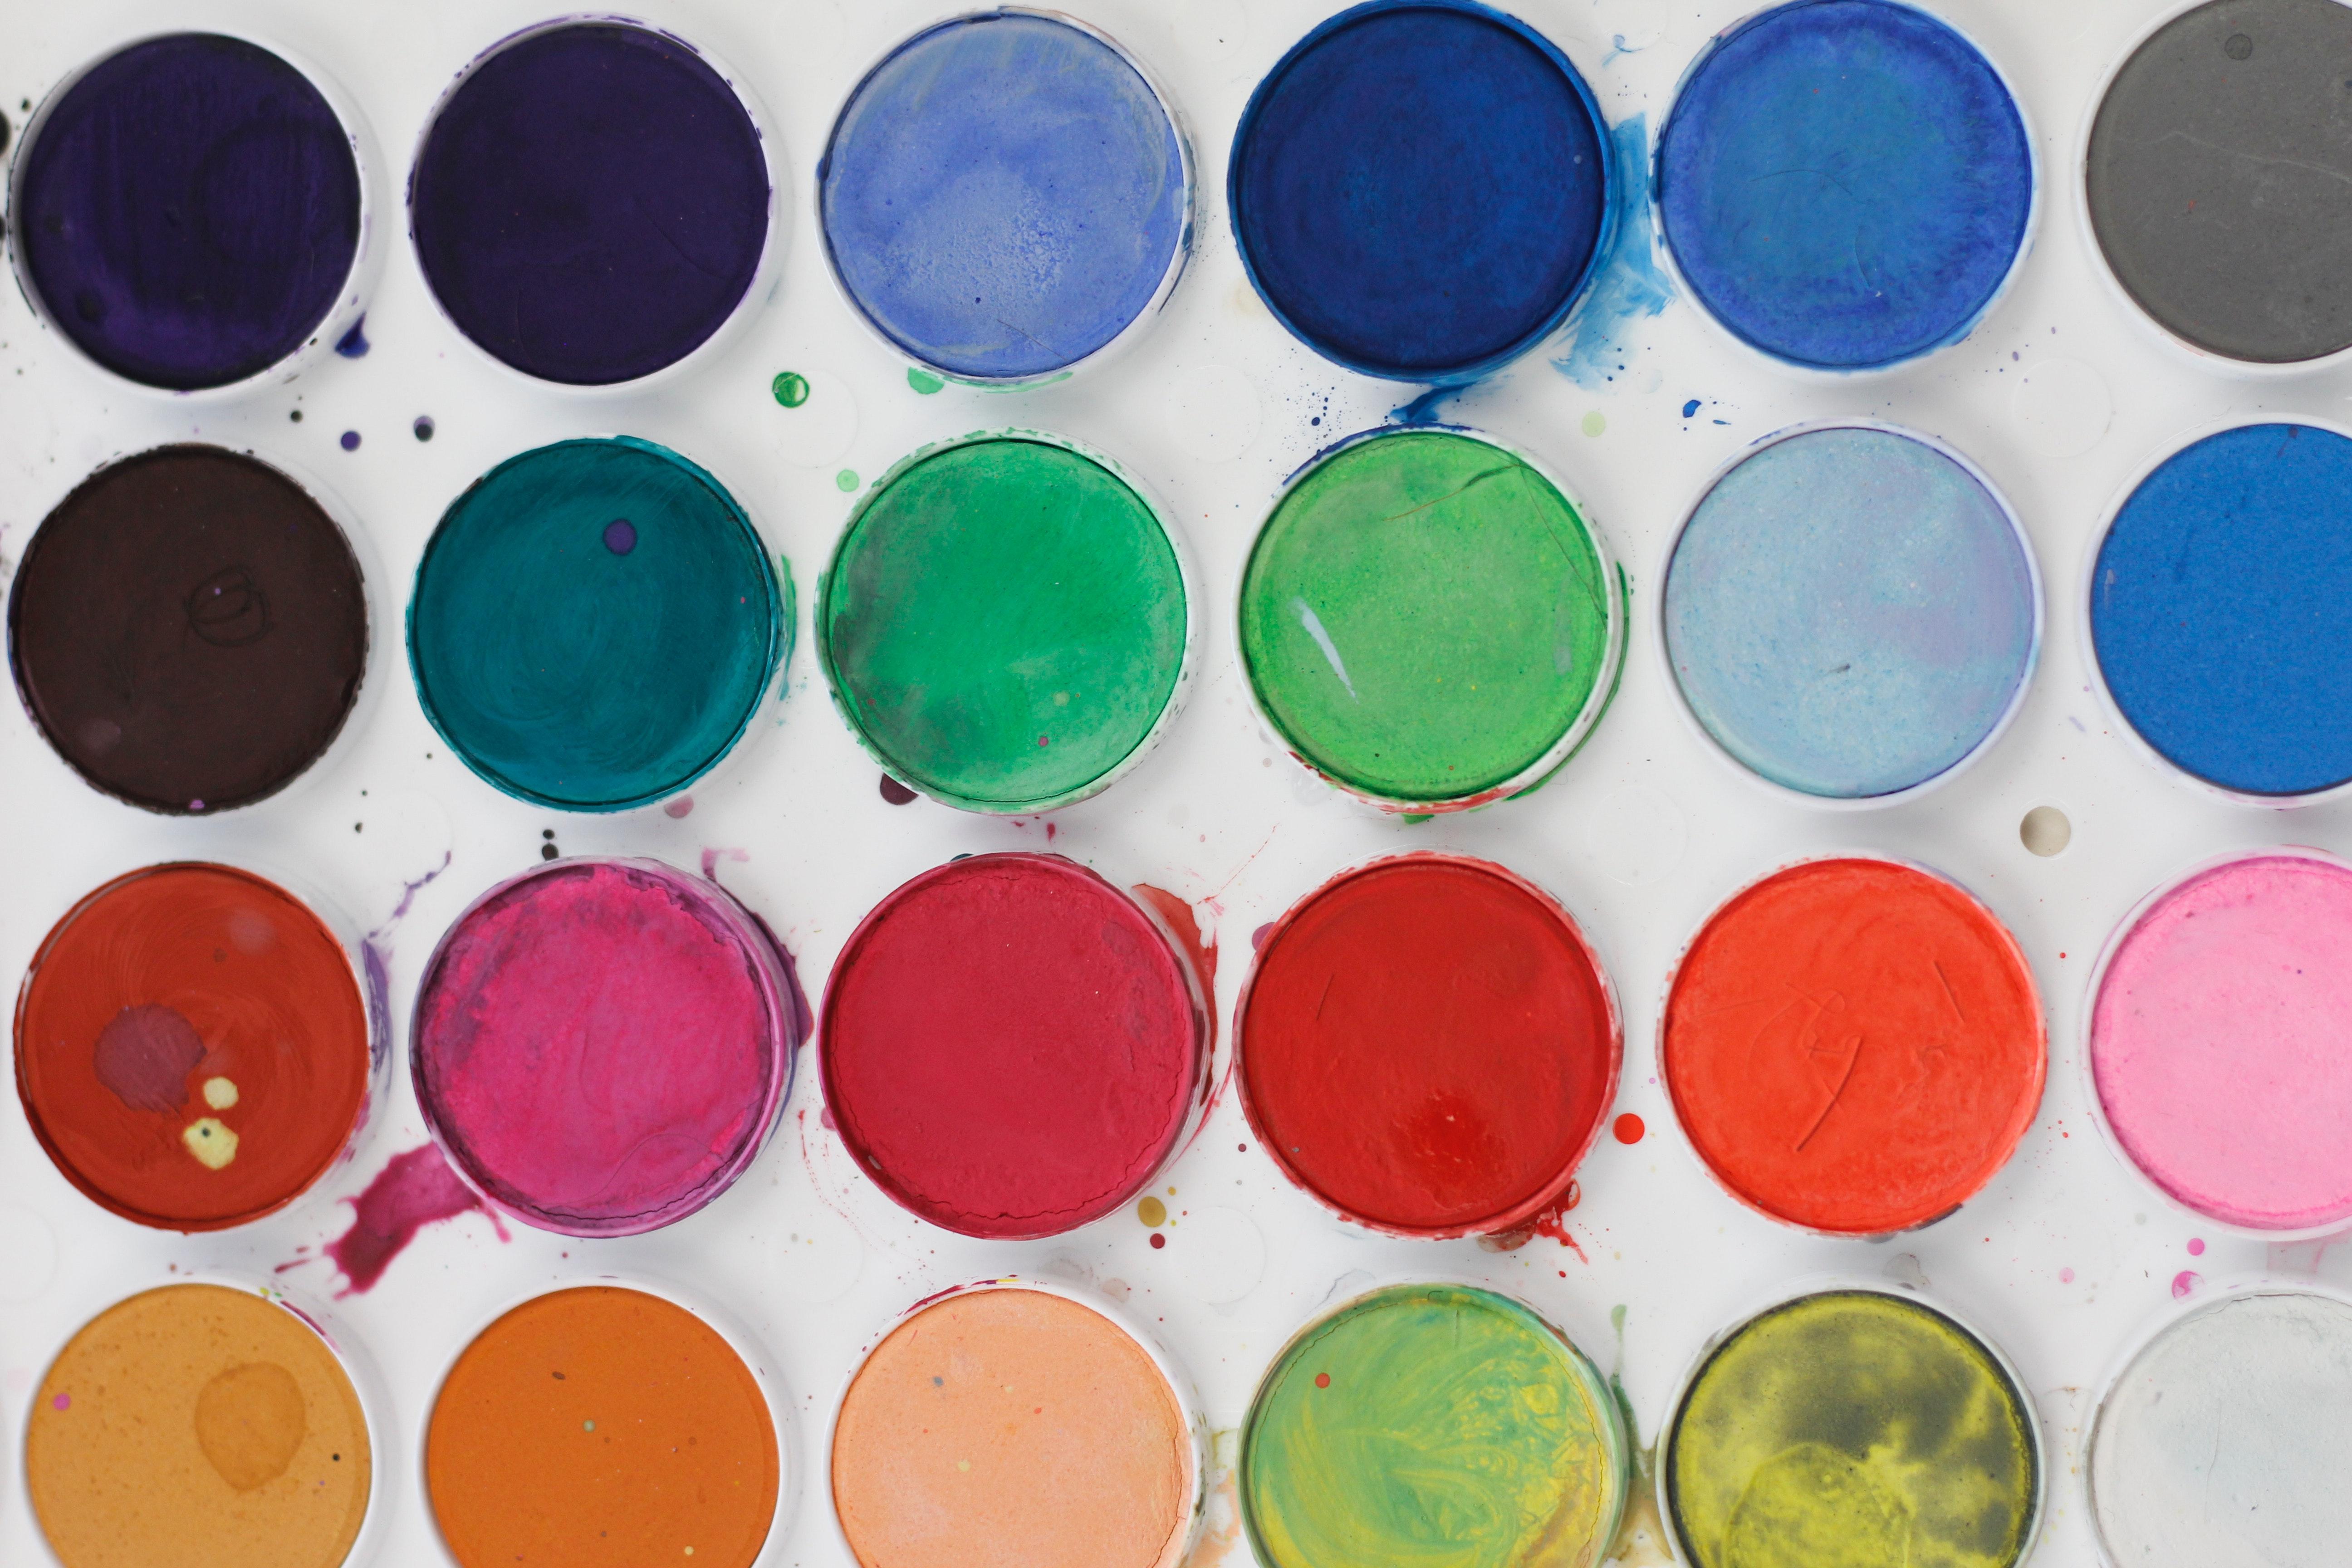 Why kids need art in school